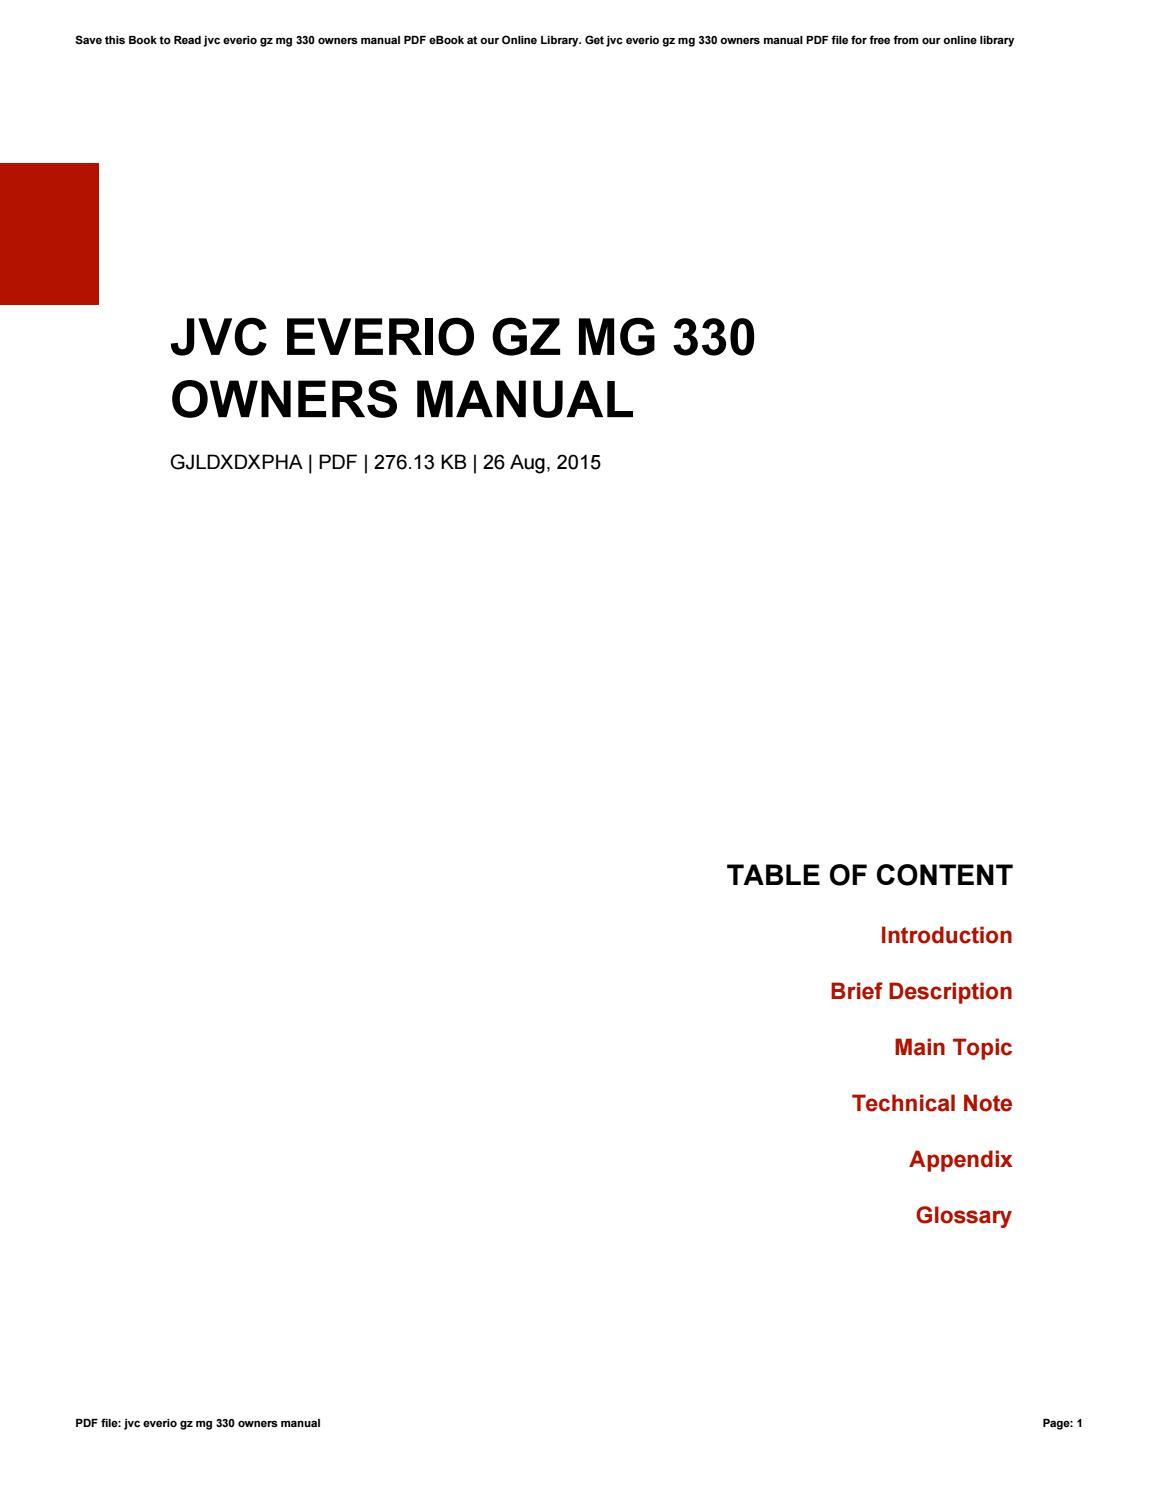 jvc everio gz mg21u user manual Array - jvc everio gz hm30au user manual  ebook rh jvc everio gz hm30au user manual